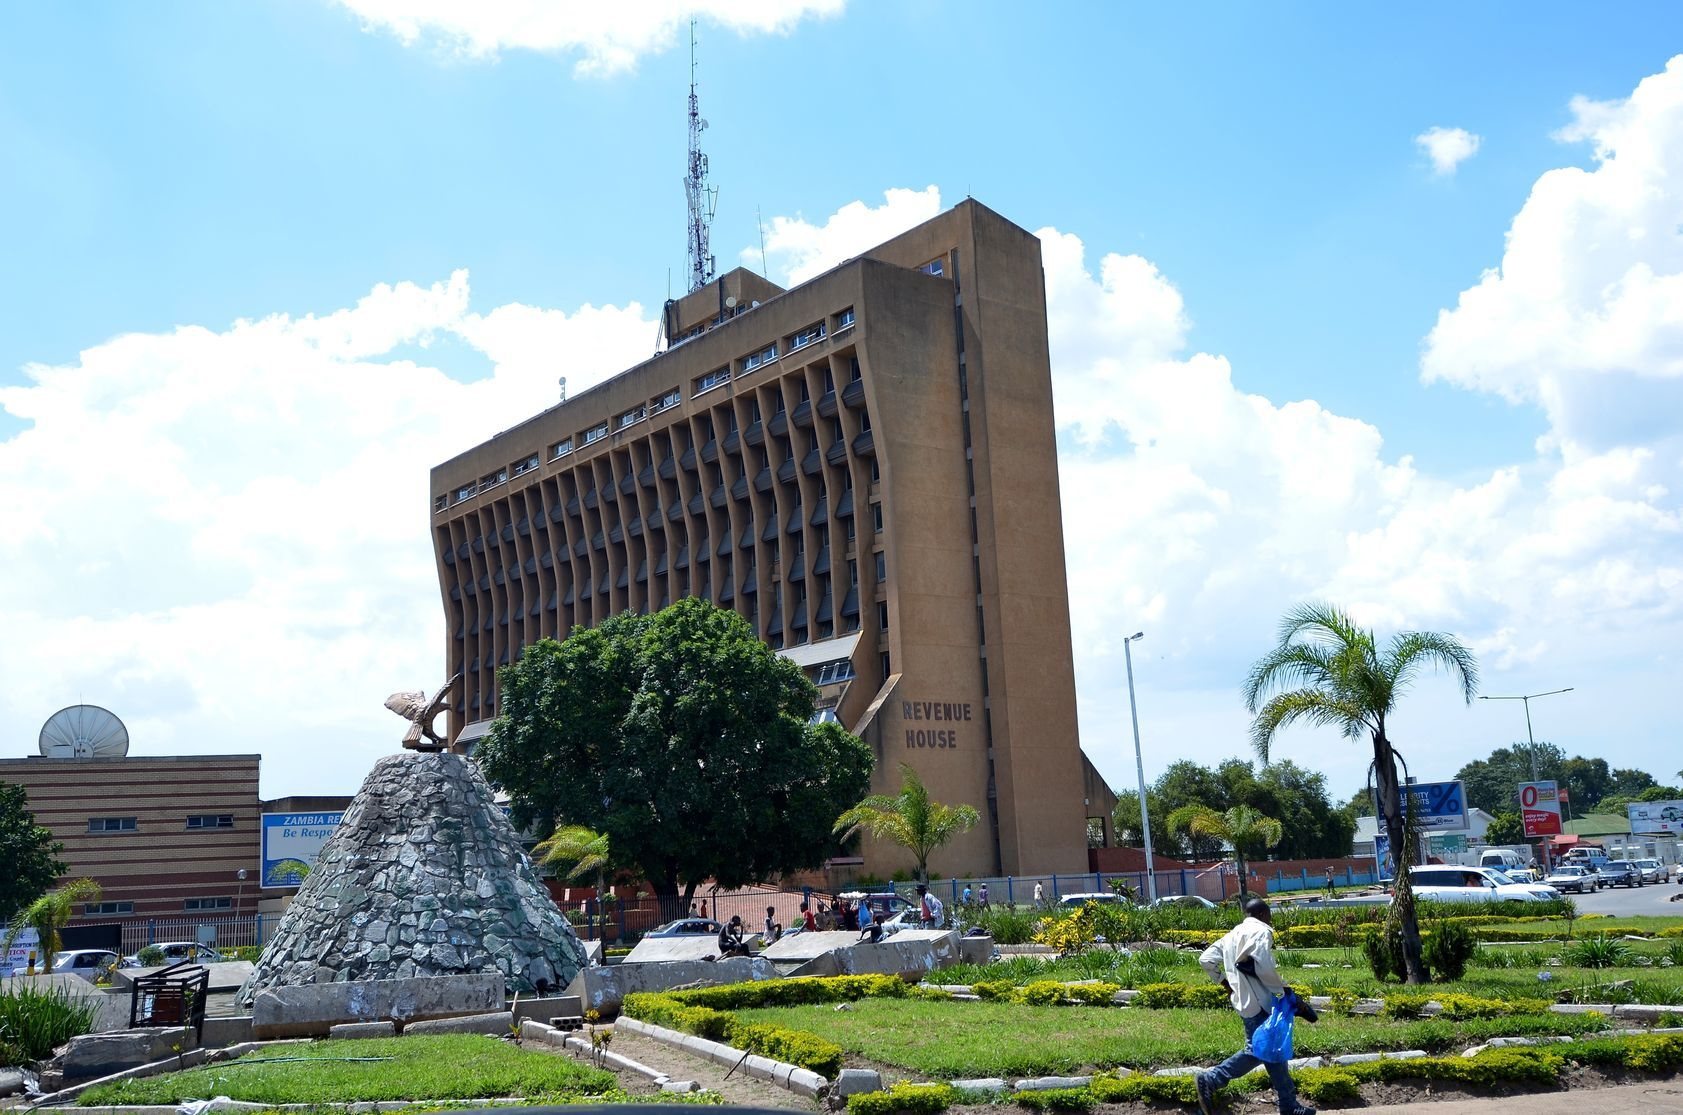 Centrum Lusaky v Zambii   djembe/123RF.com